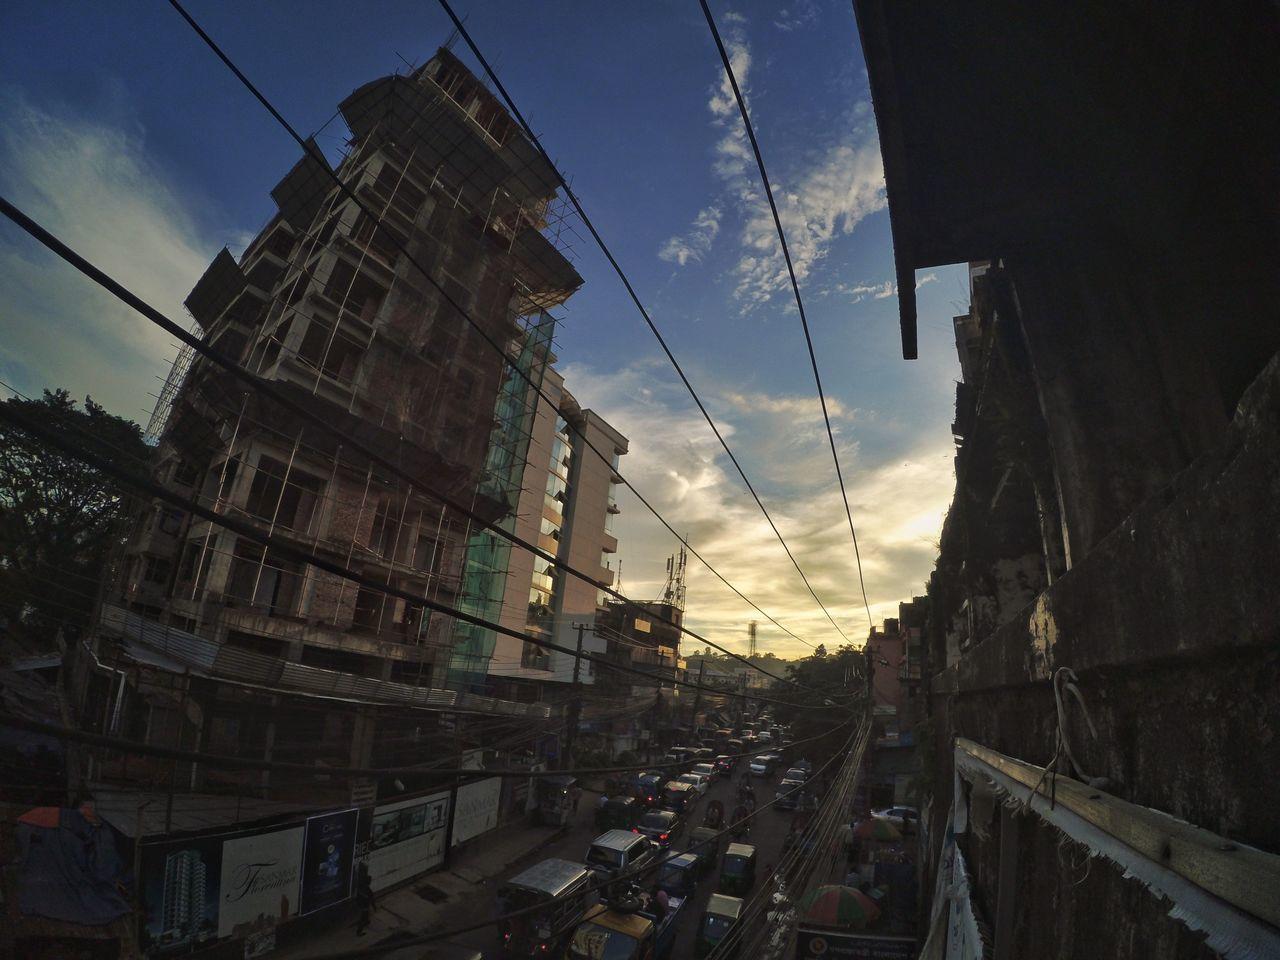 sky, architecture, transportation, building exterior, cable, built structure, cloud - sky, car, road, city, electricity pylon, outdoors, land vehicle, no people, day